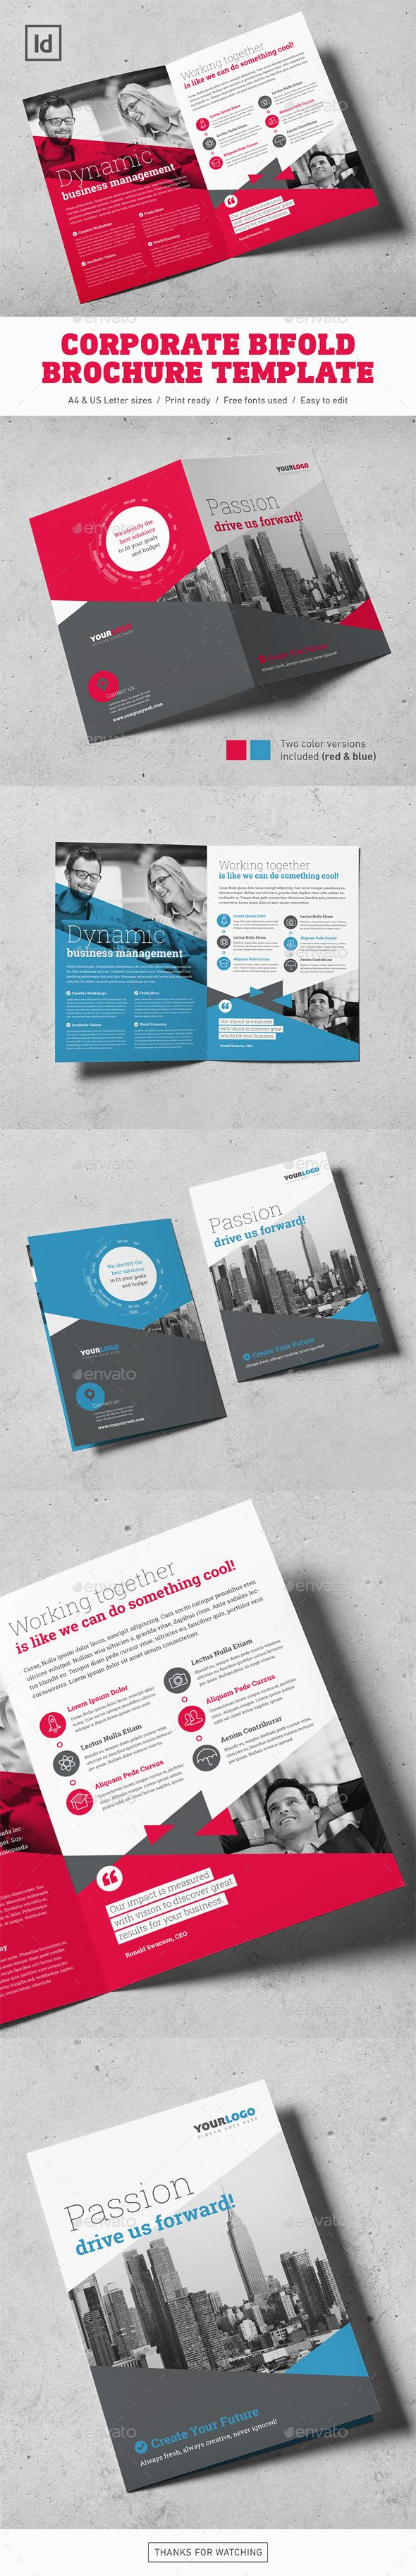 Corporate Bifold Brochure Template Brochure Template Brochures - Bi fold brochure template indesign